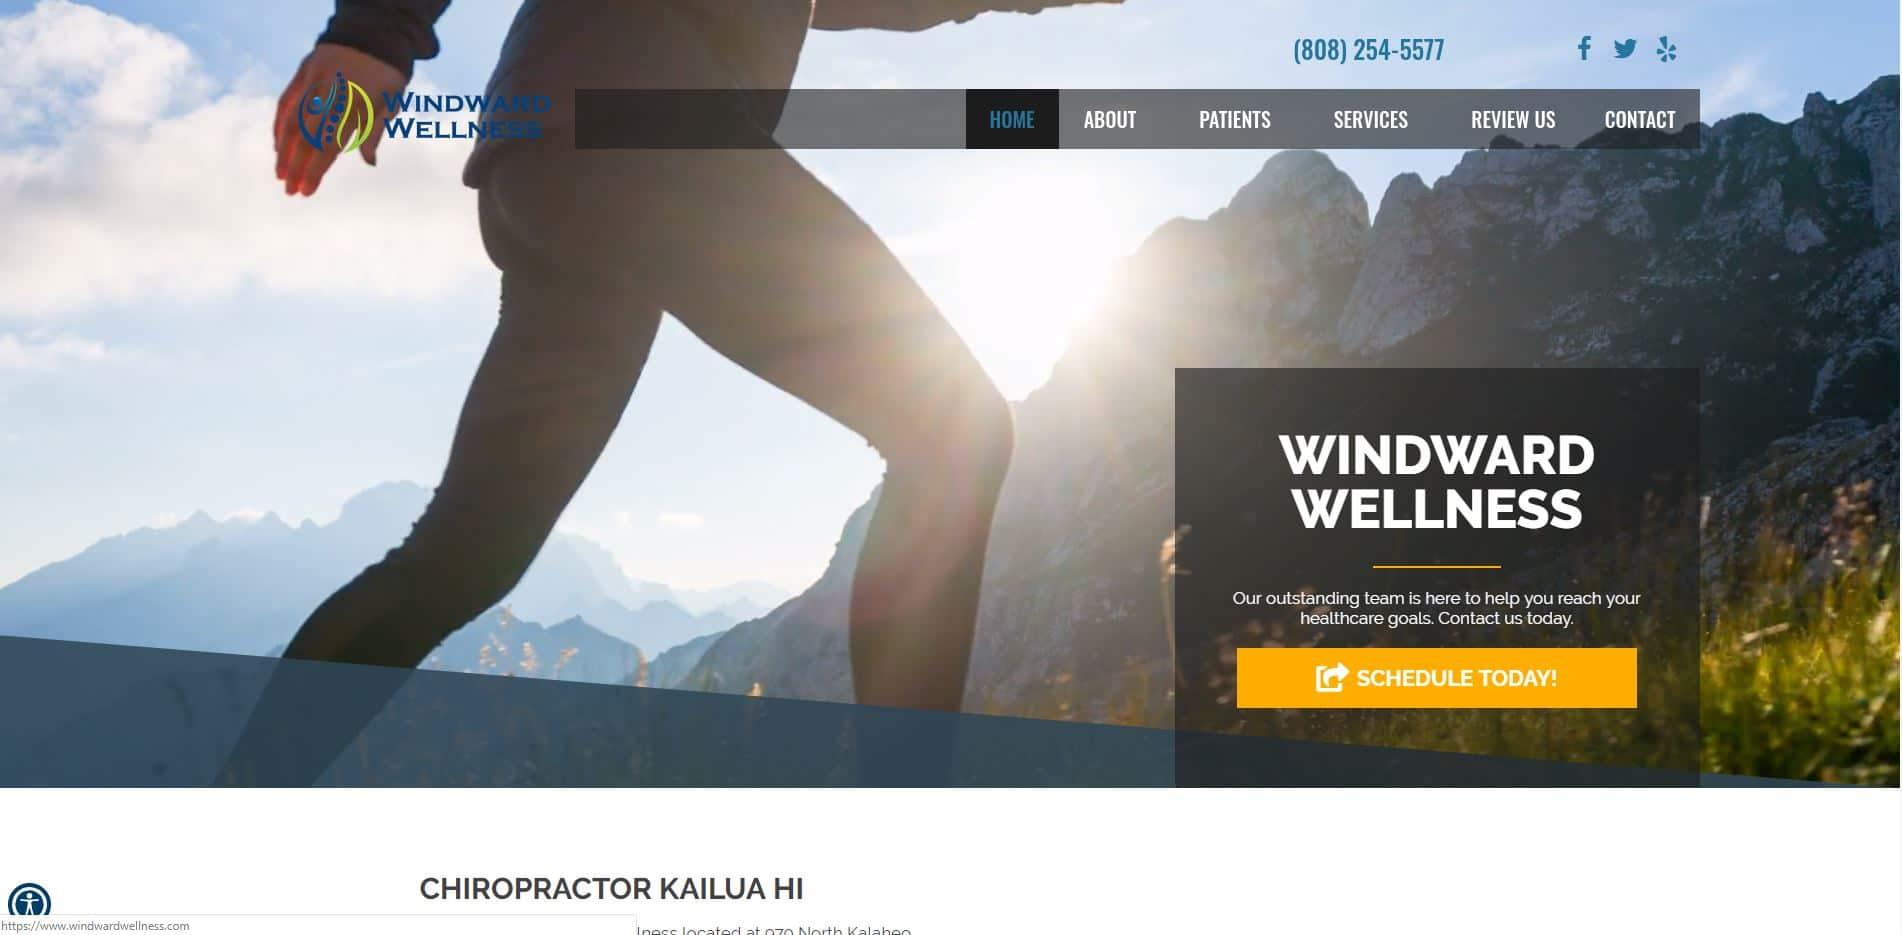 Chiropractor Kailua HI Windward Wellness